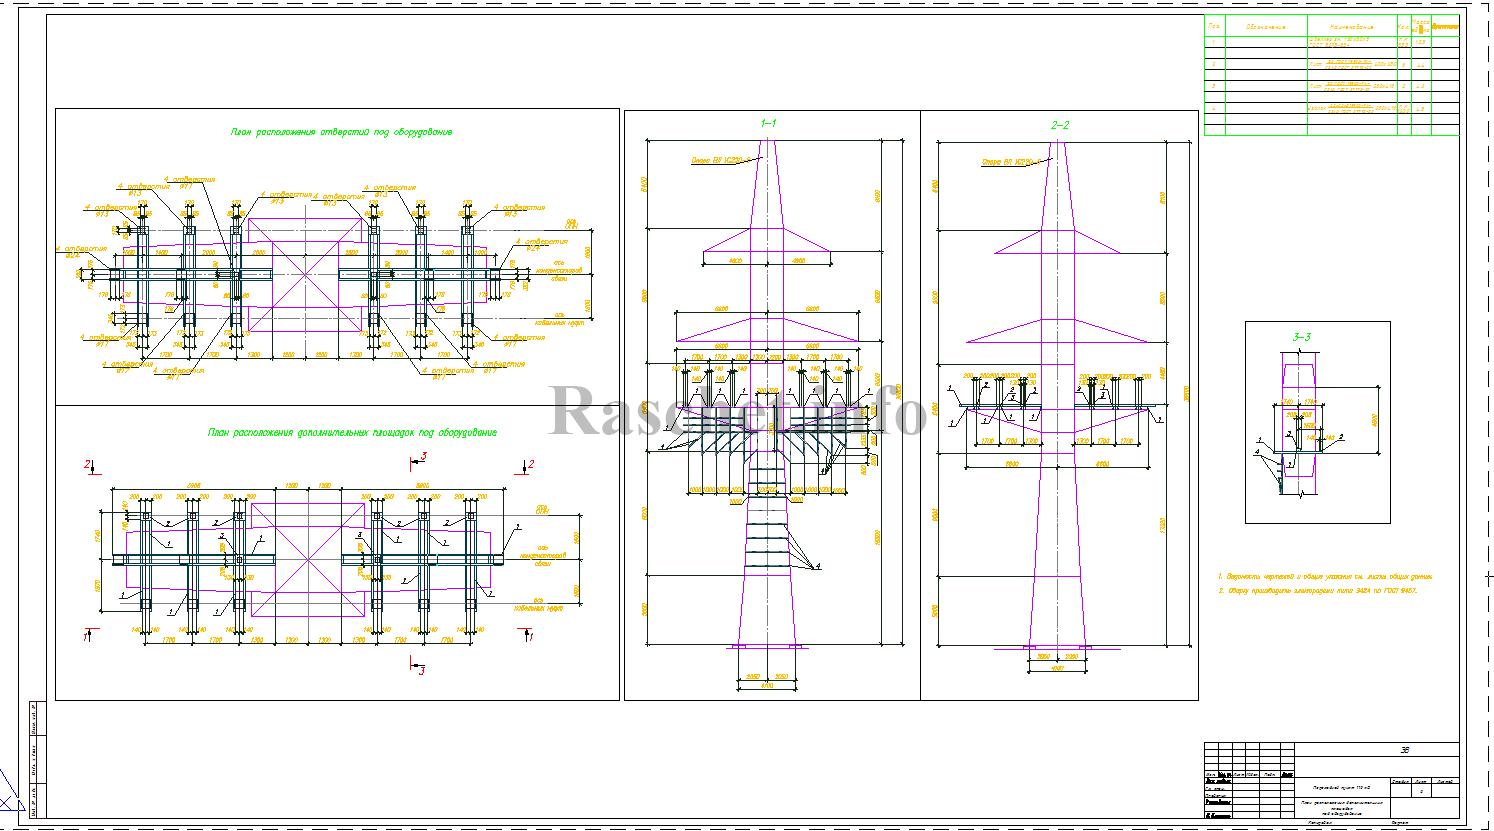 Чертеж установки переходного пункта 110 кВ в формате dwg